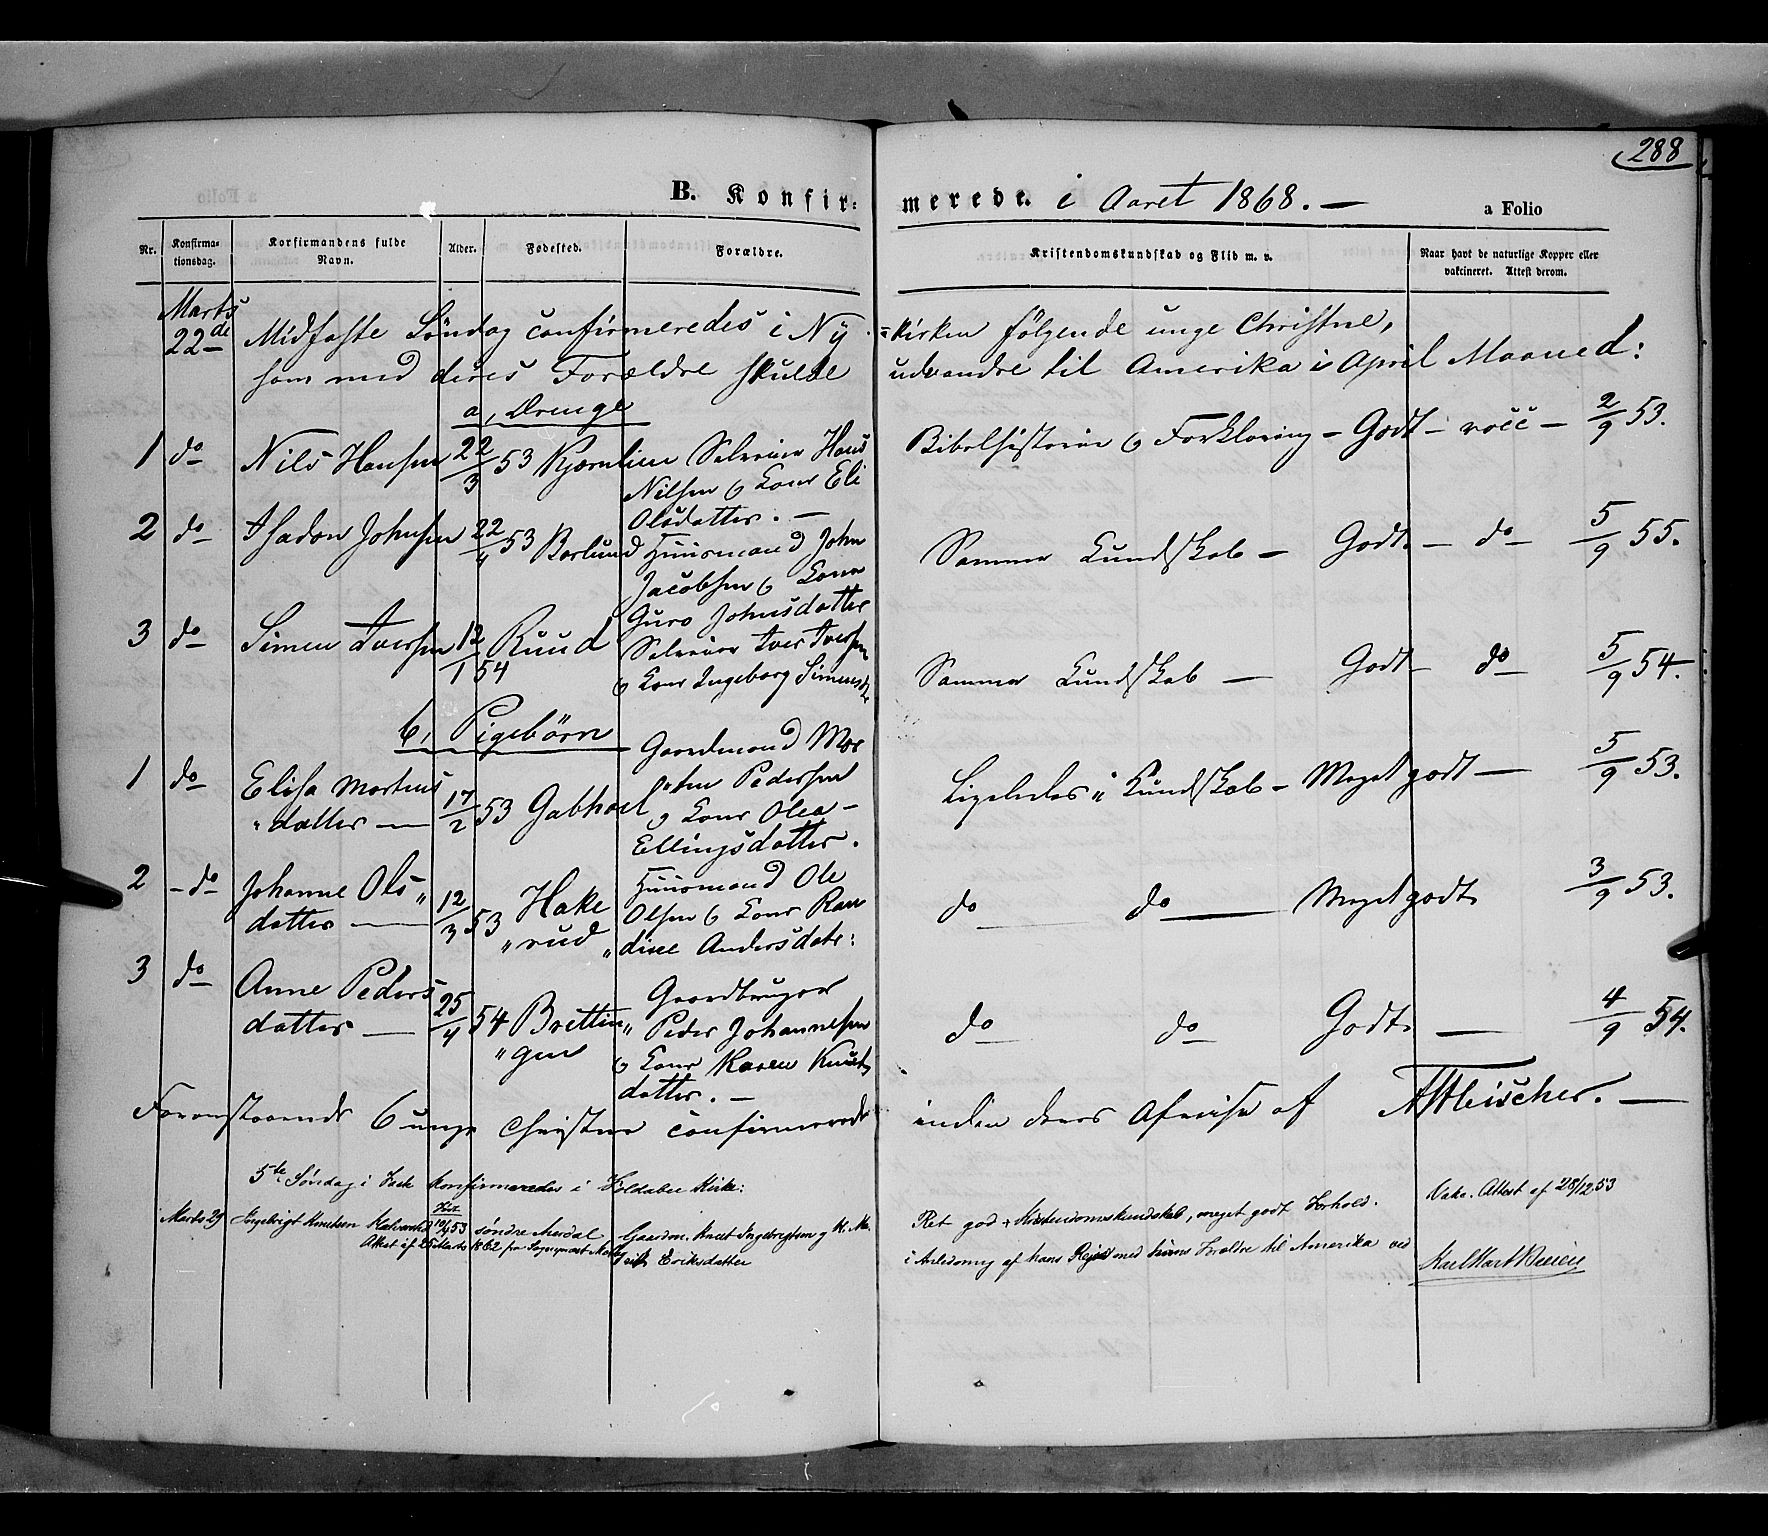 SAH, Gausdal prestekontor, Ministerialbok nr. 9, 1862-1873, s. 288